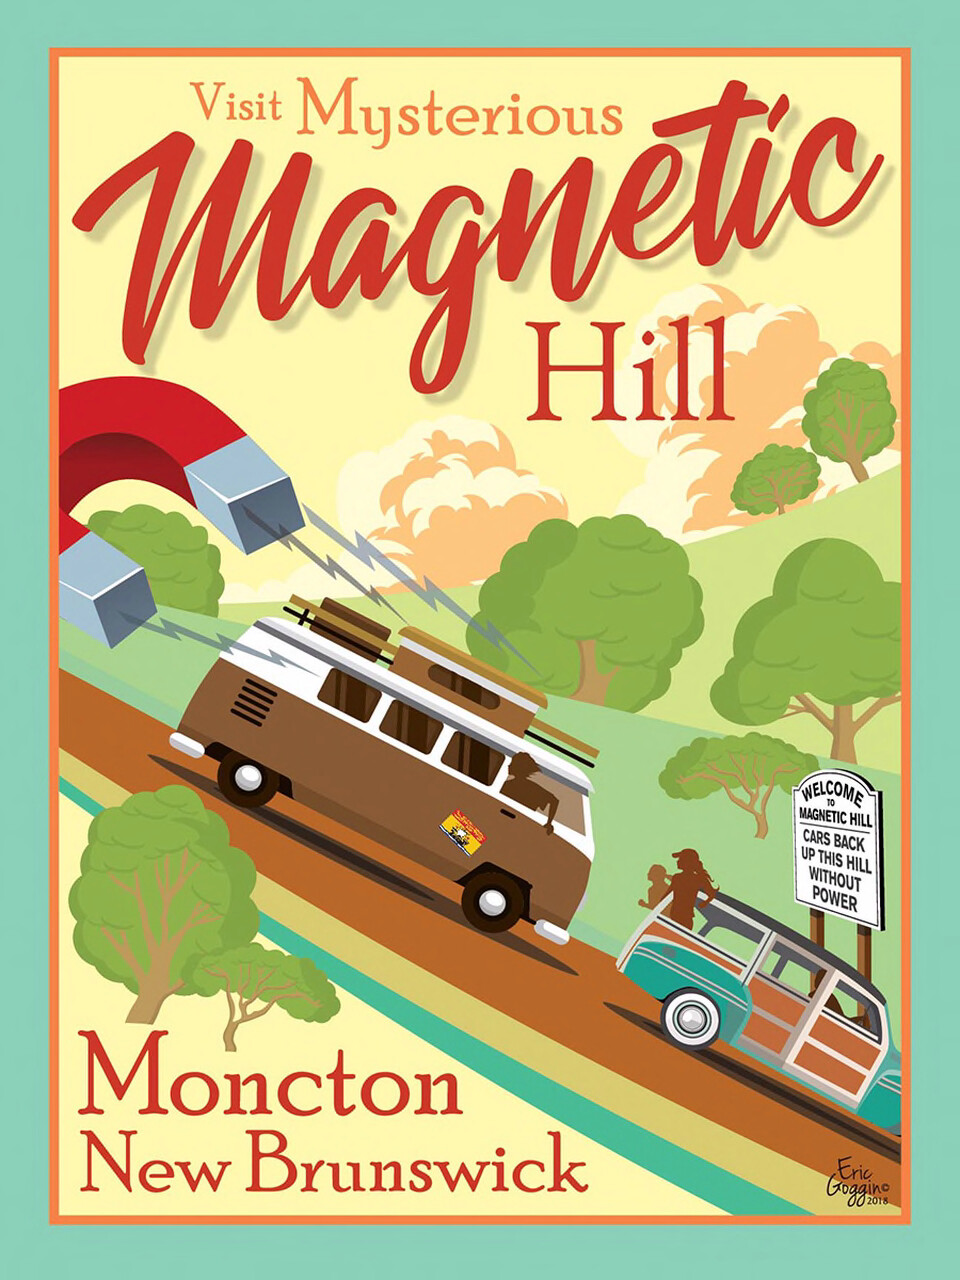 Magnetic Hill 11x14 - Destination Art